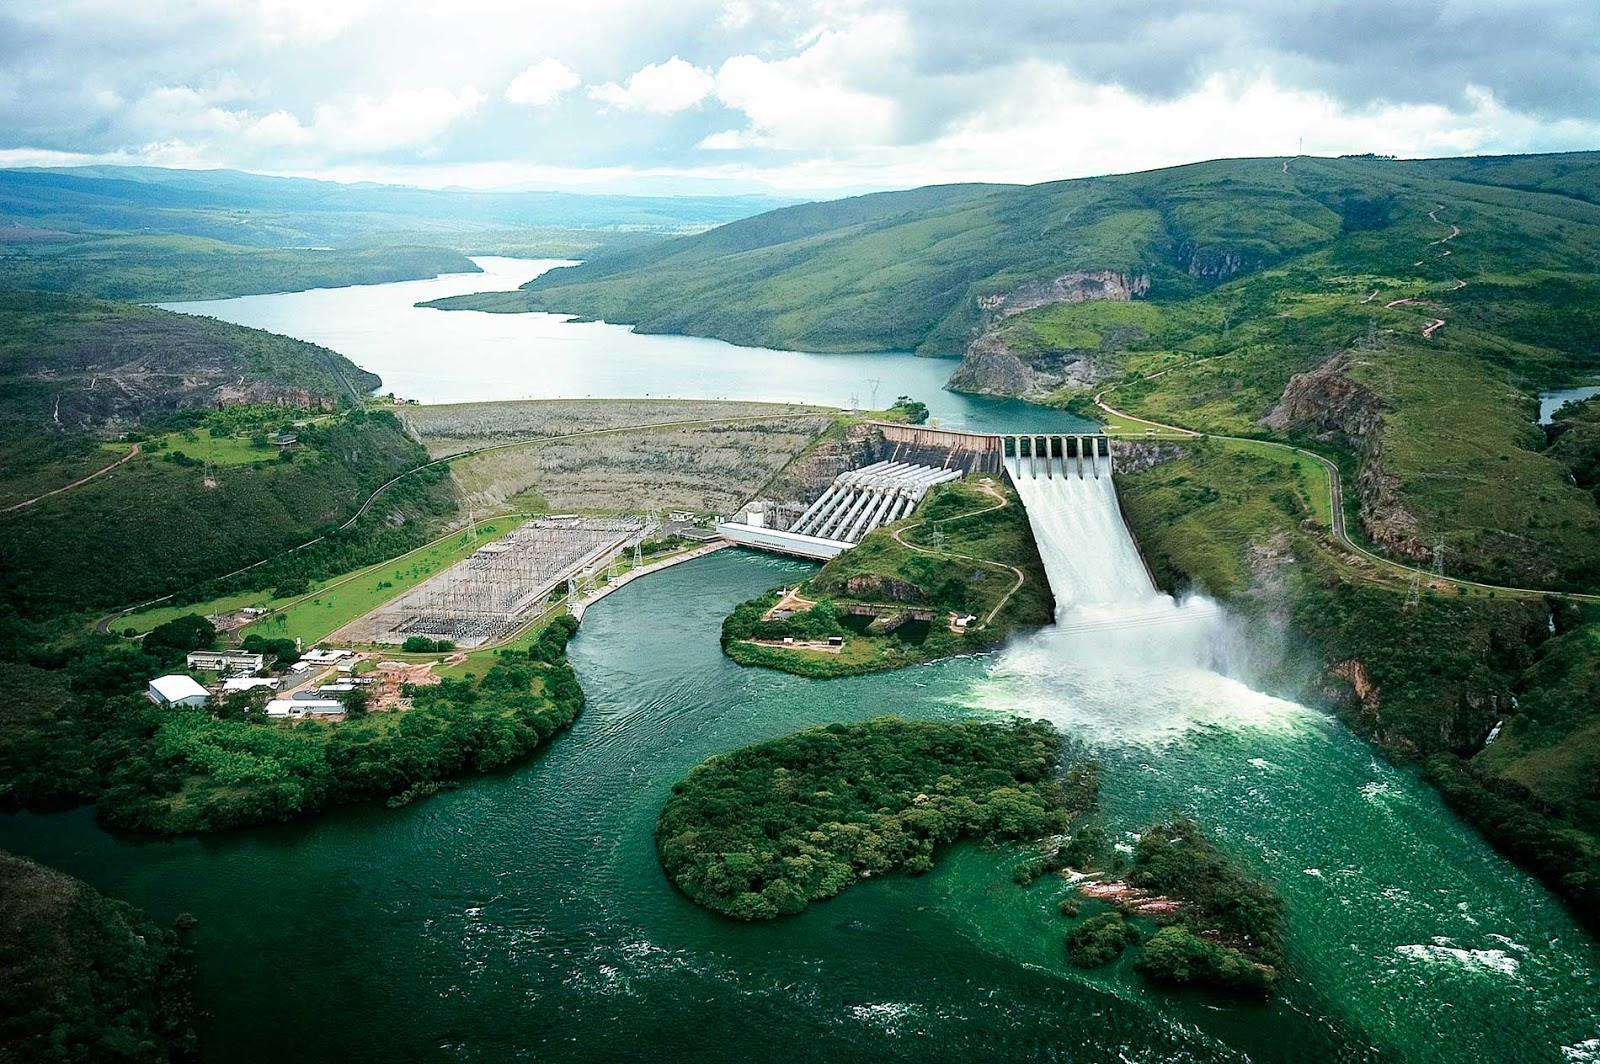 Embalse de Furnas, Usina Hidrelétrica de Furnas, Reservatório de Furnas - Megaconstrucciones, Extreme Engineering